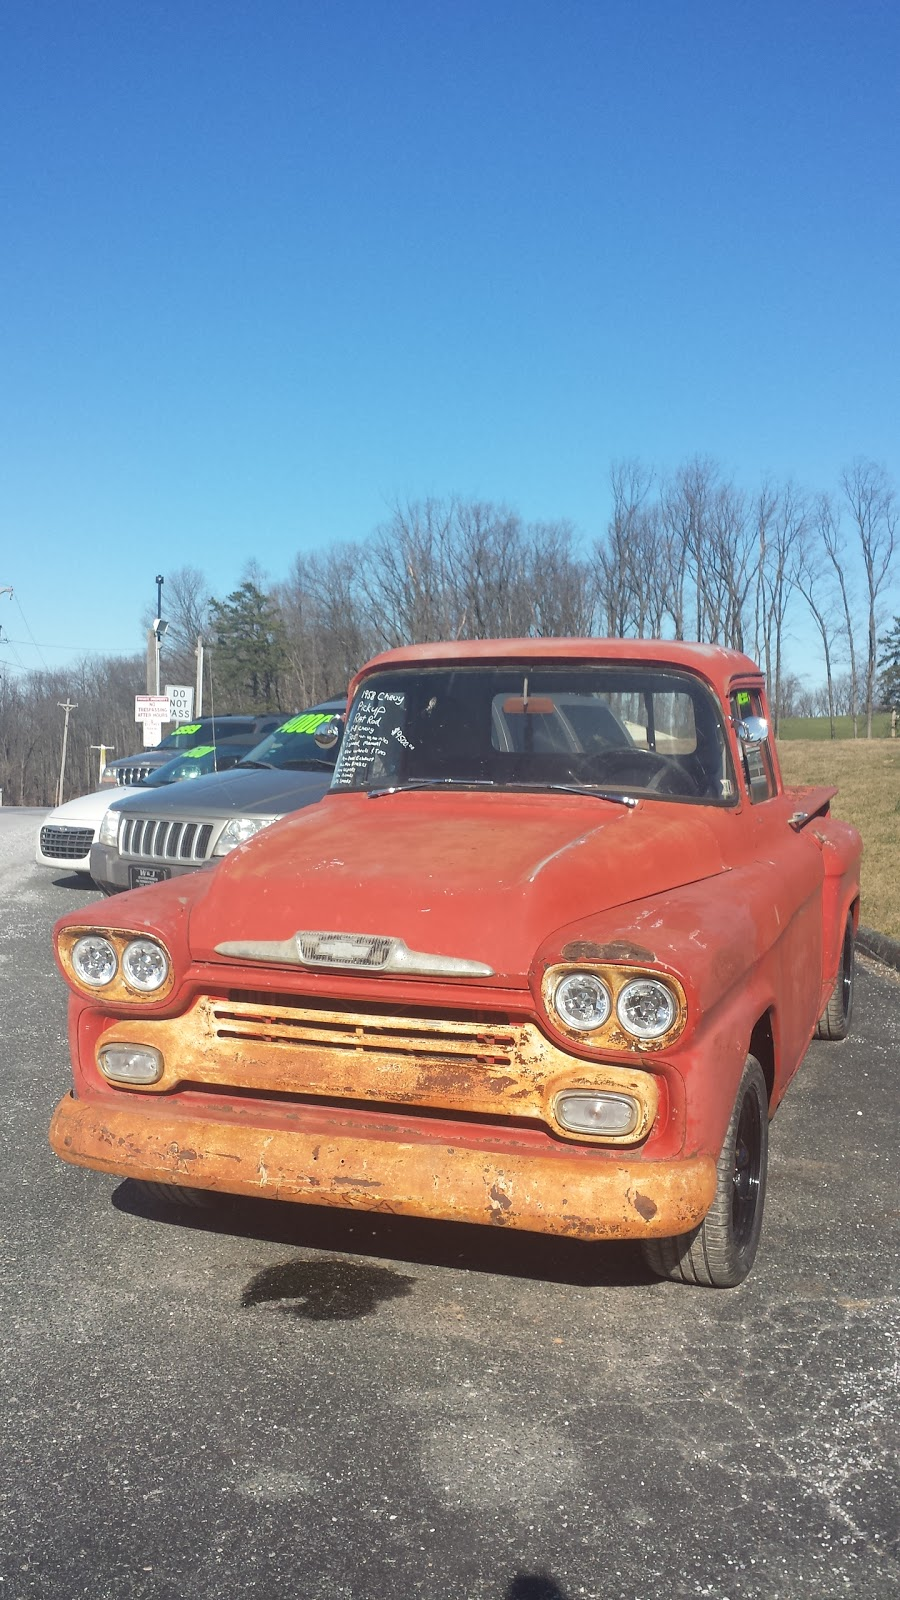 W & J Enterprise - car repair  | Photo 1 of 2 | Address: 3185 Delta Rd # A, Airville, PA 17302, USA | Phone: (717) 322-1041